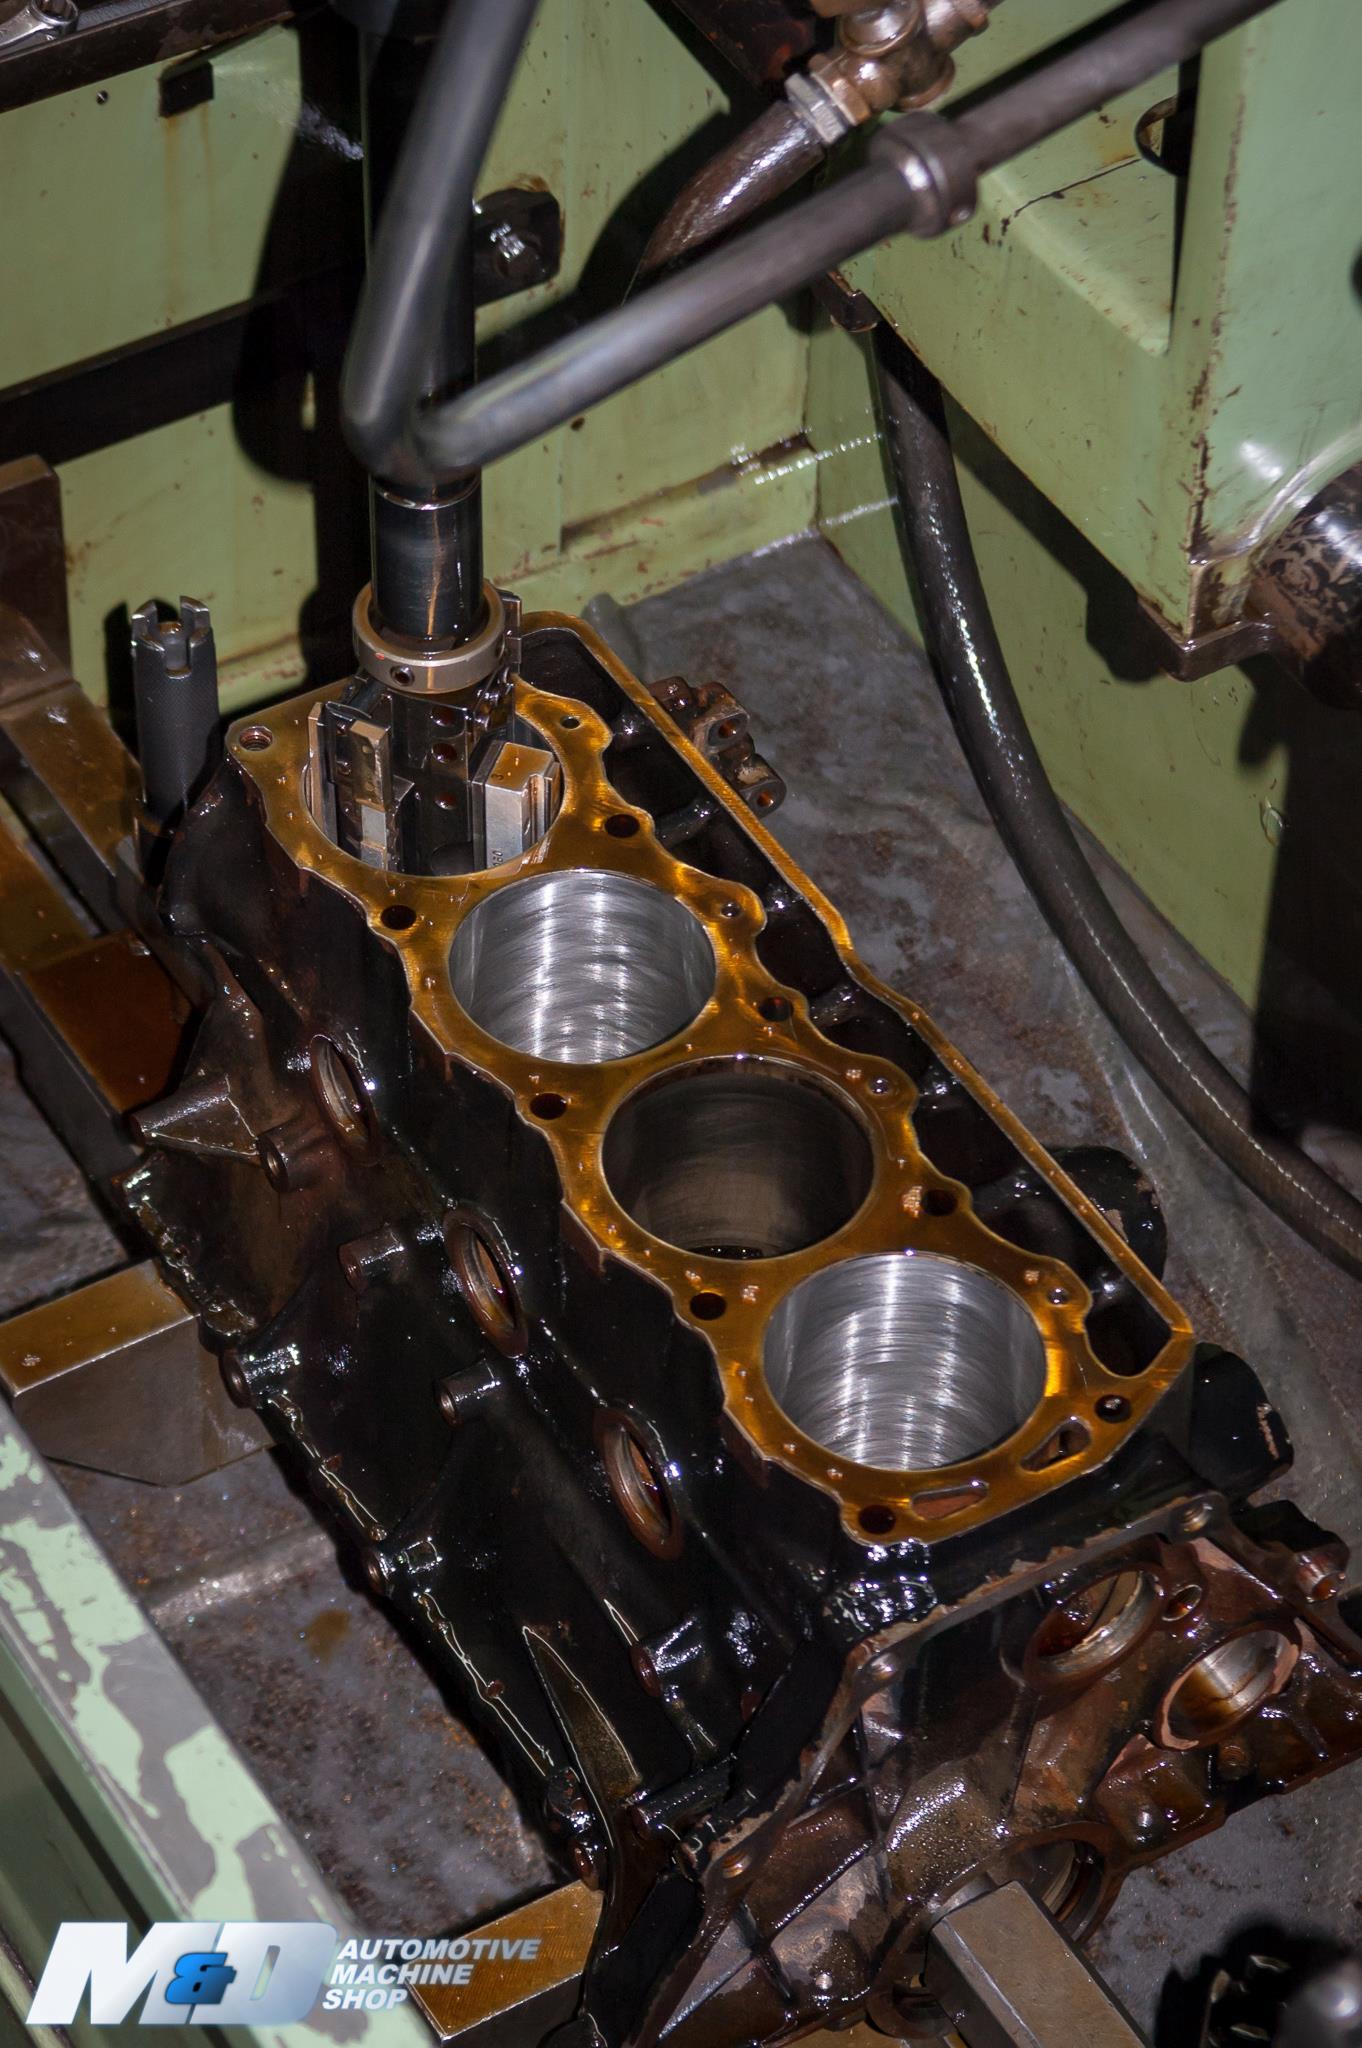 mdr_engines9.jpg